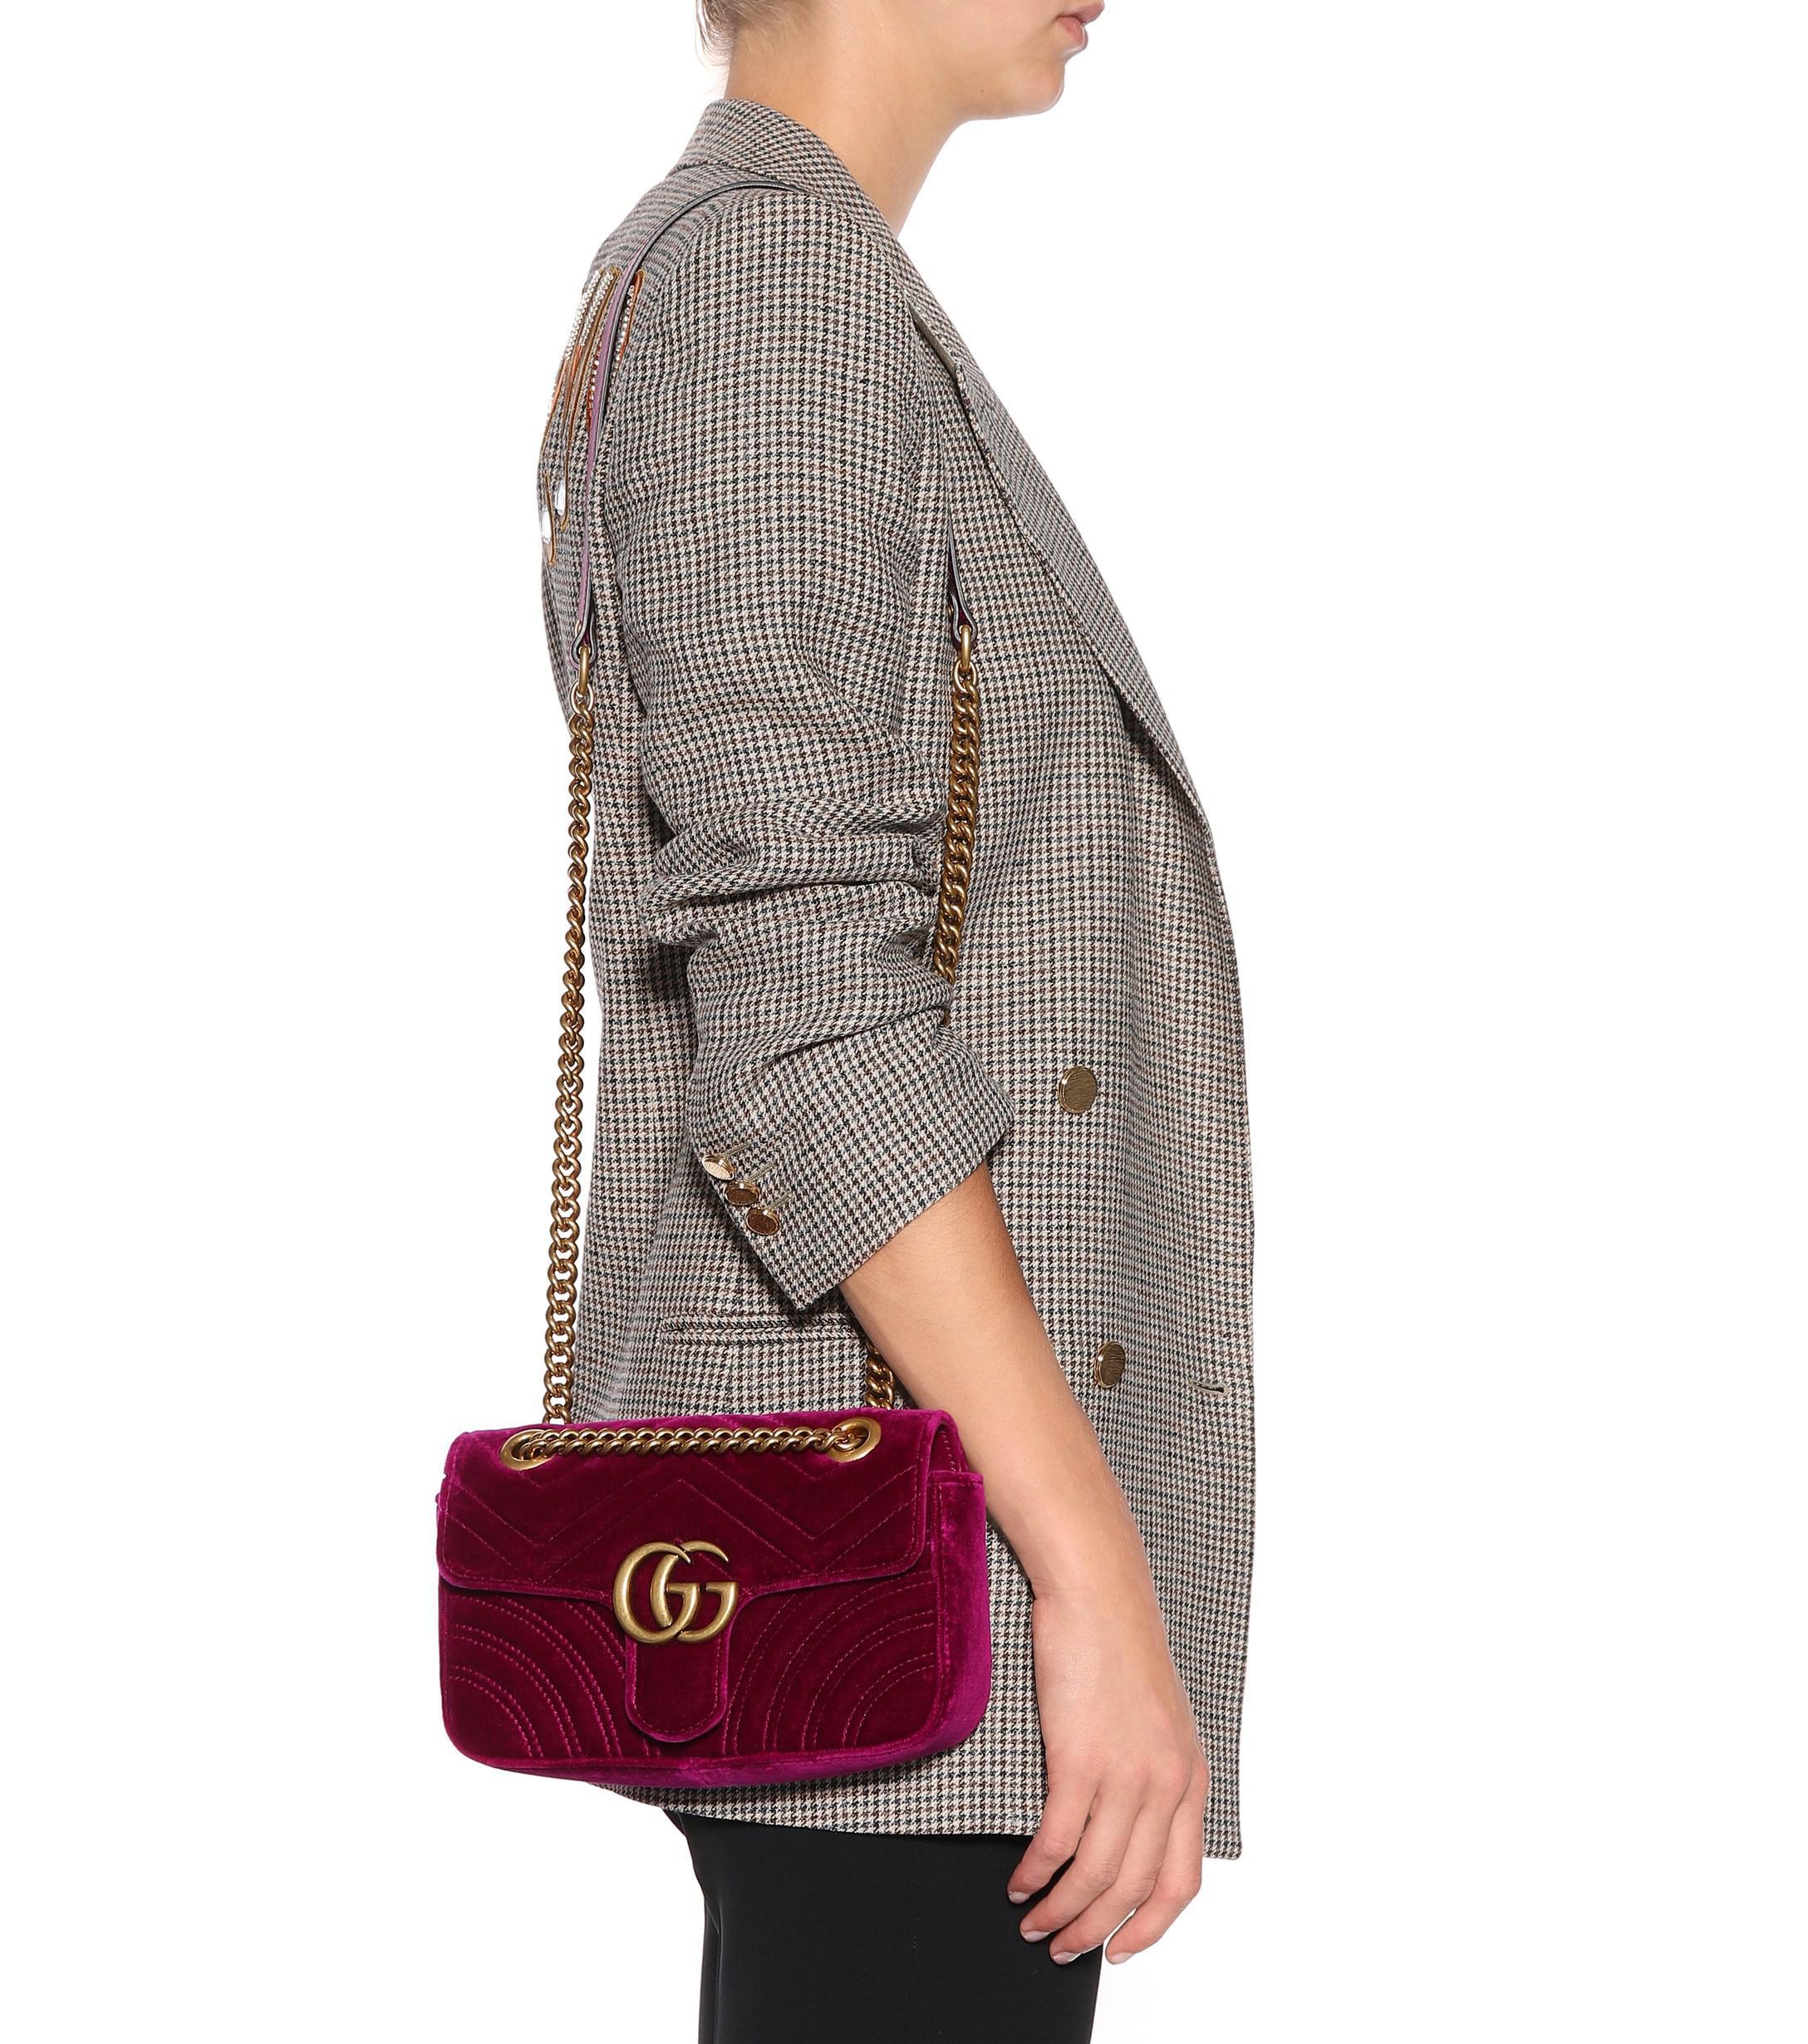 d7ef284e57248 Gucci - Purple GG Marmont Mini Velvet Shoulder Bag - Lyst. View fullscreen